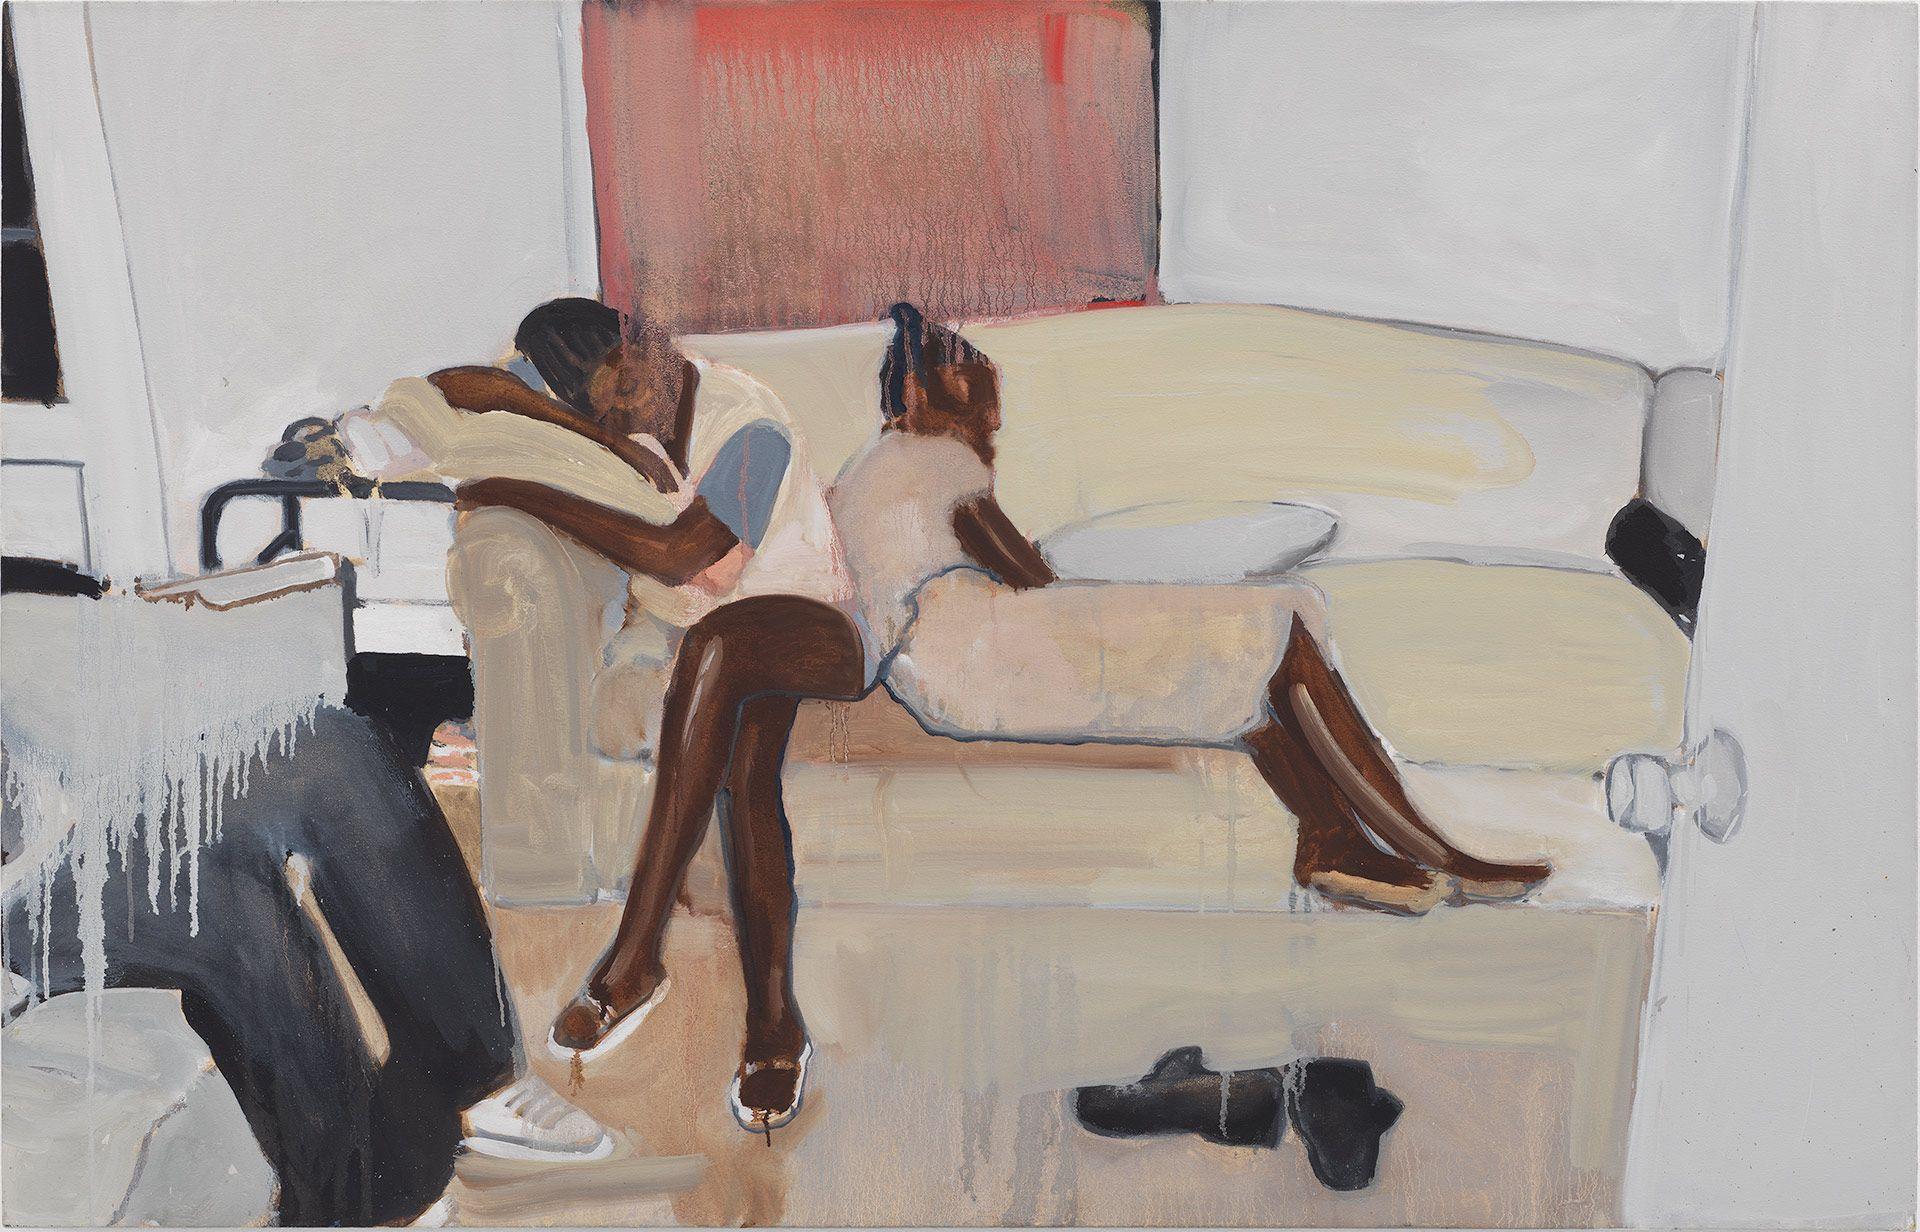 painting by artist Noah Davis